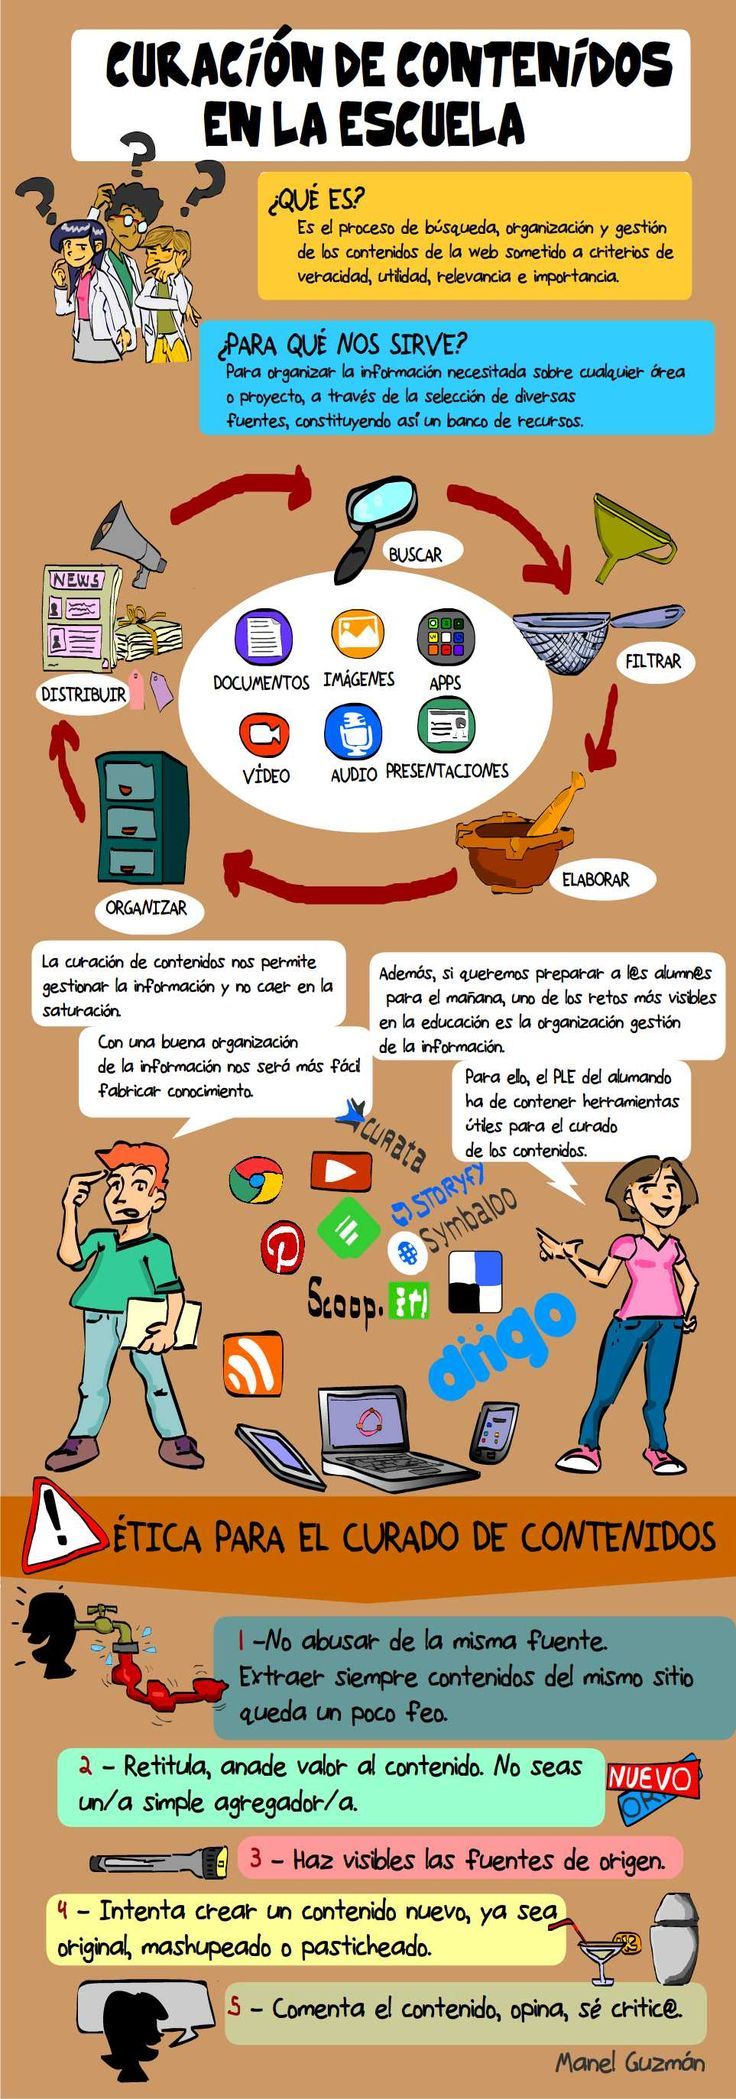 Curación de contenidos para la escuela #infografia #infographic #socialmedia…